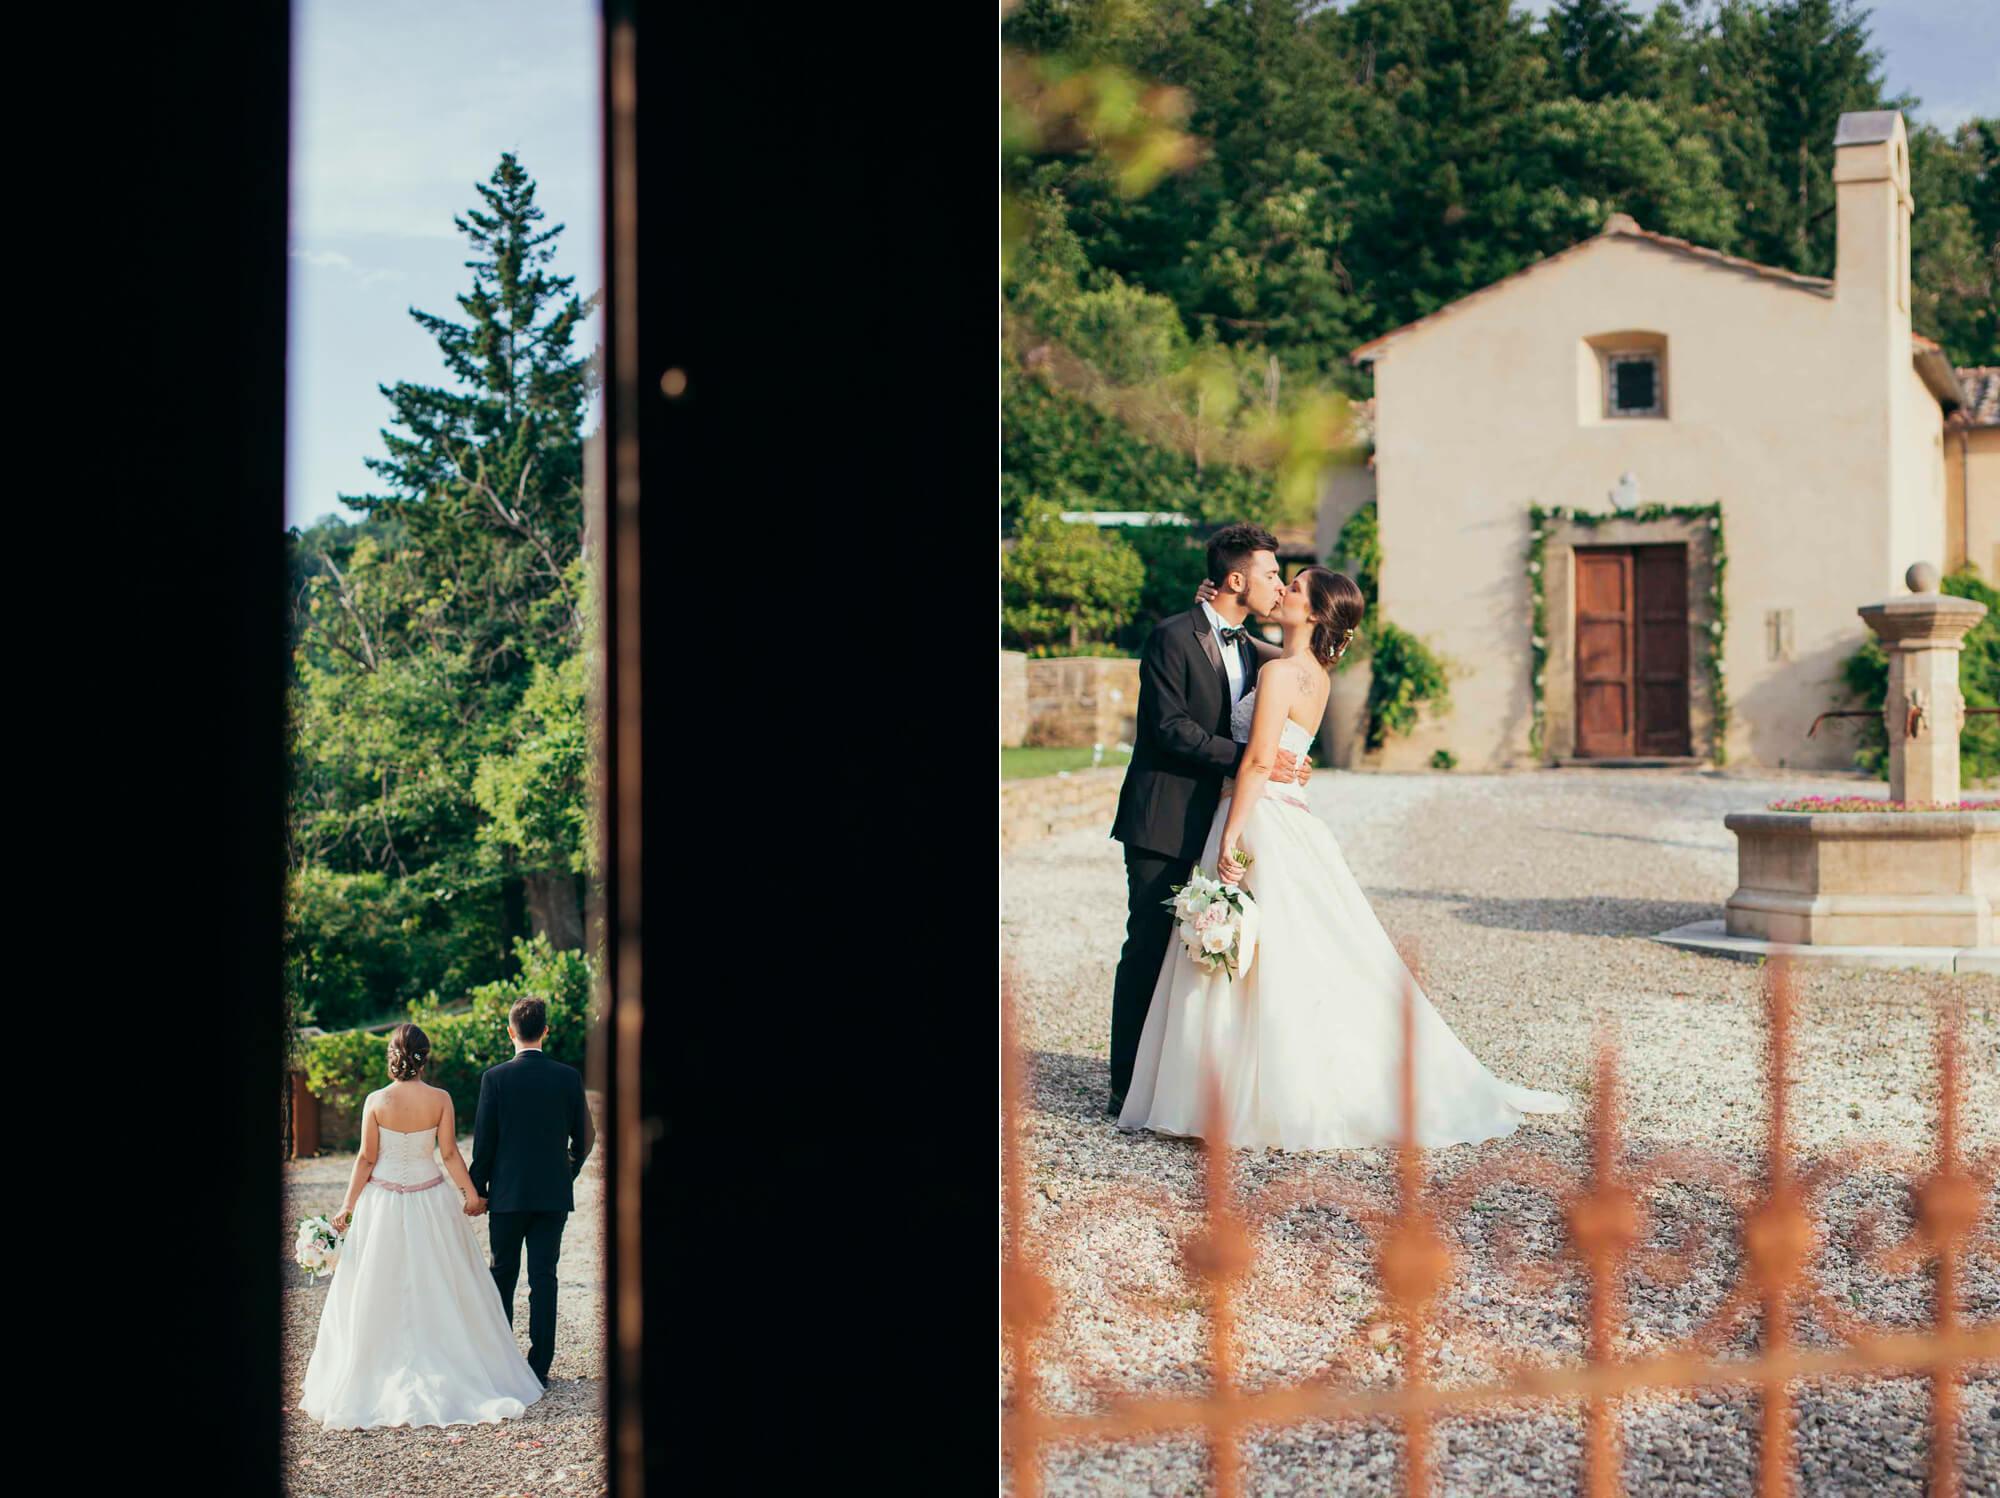 078-arezzo-wedding-photographer.jpg